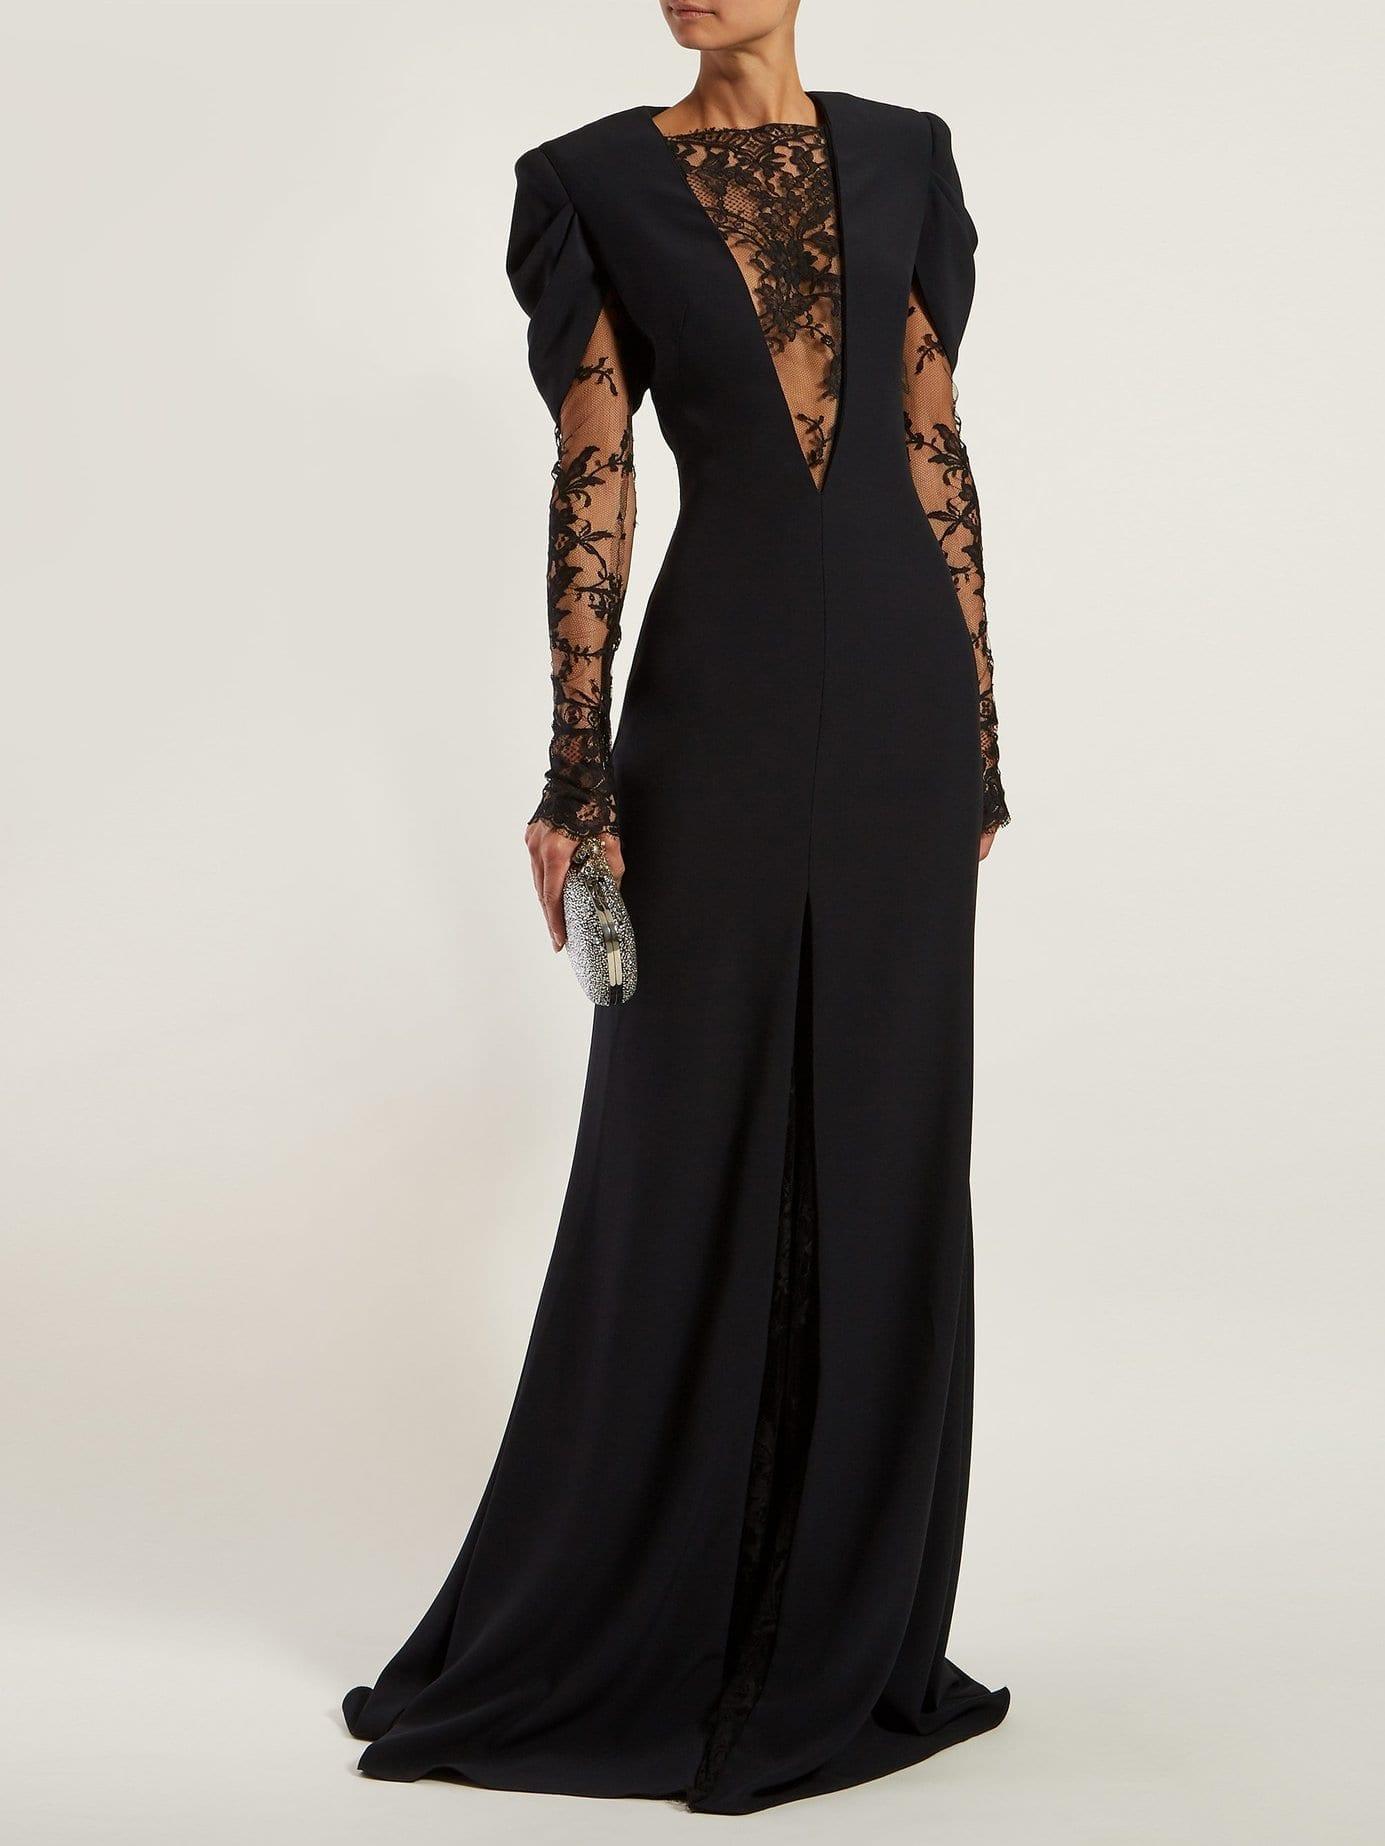 ALEXANDER MCQUEEN Lace-insert Crepe Black Gown